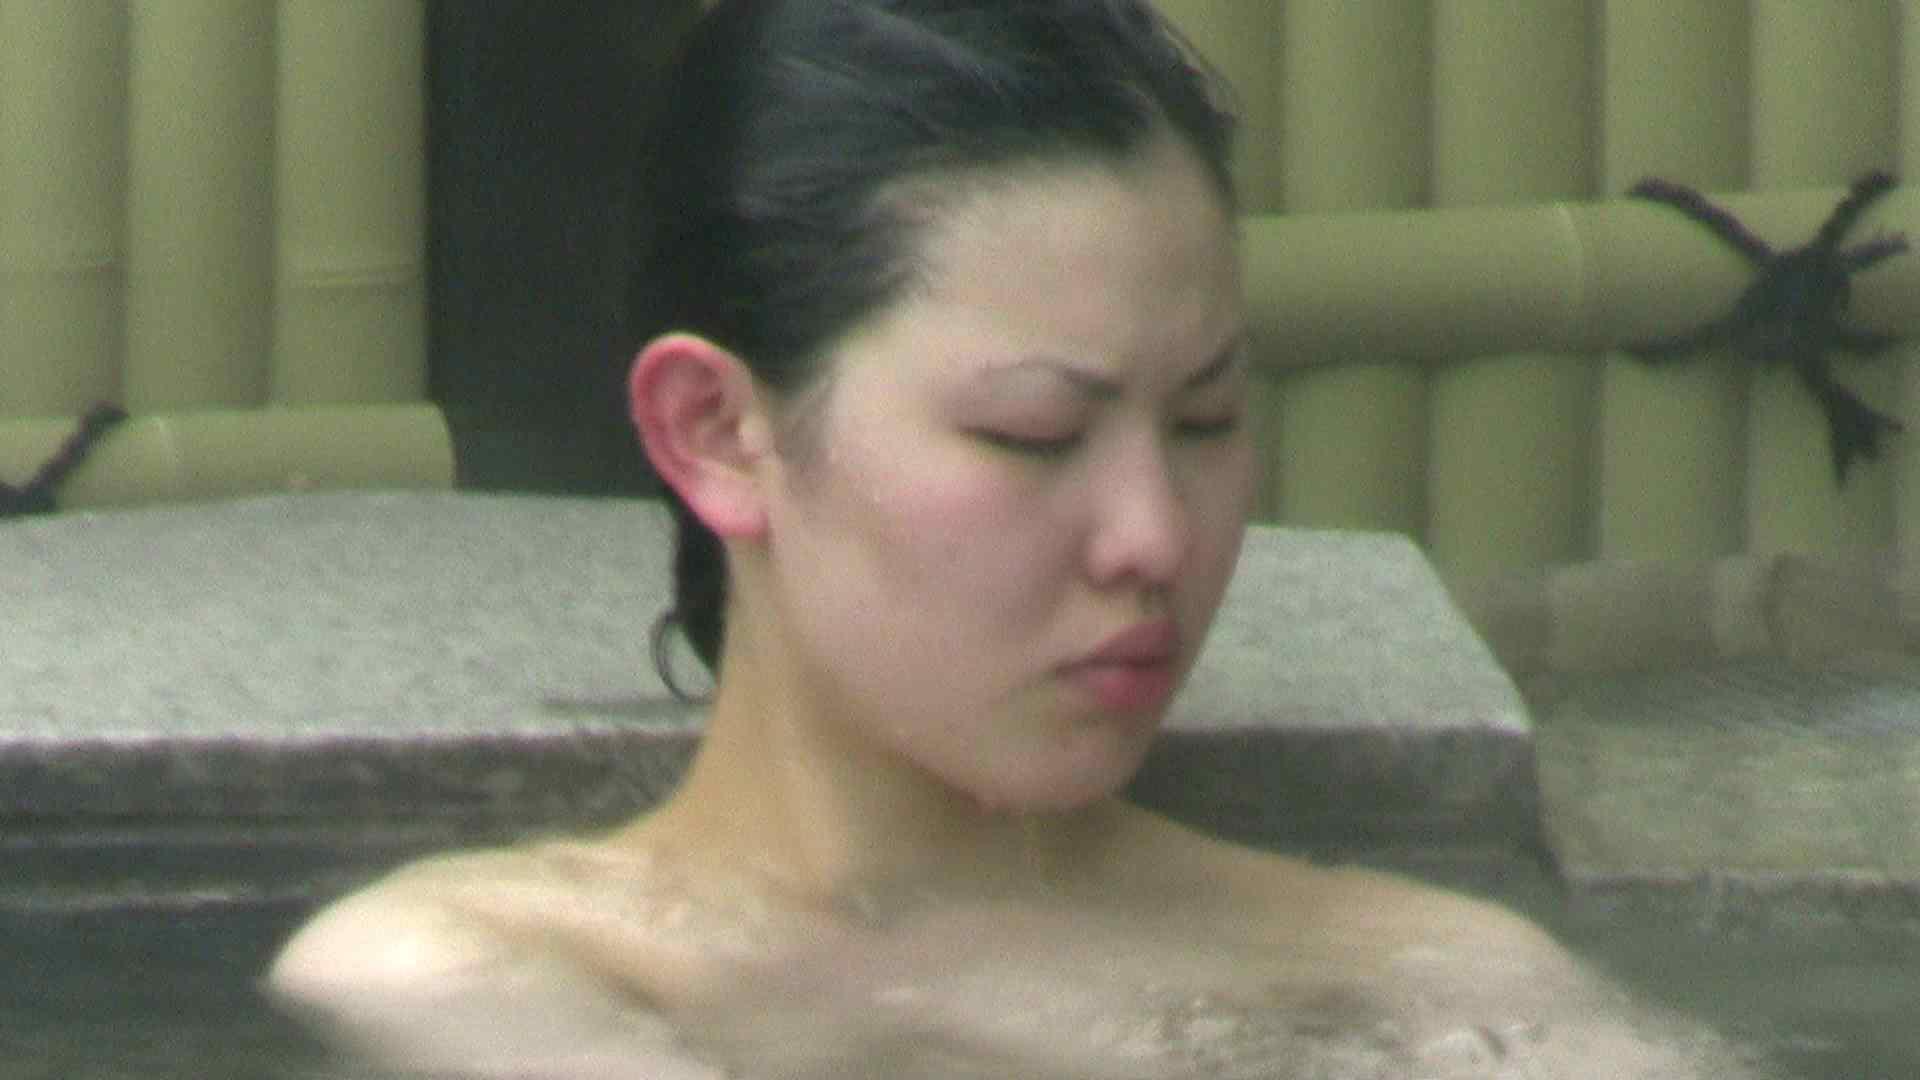 Aquaな露天風呂Vol.114 盗撮映像  72Pix 69